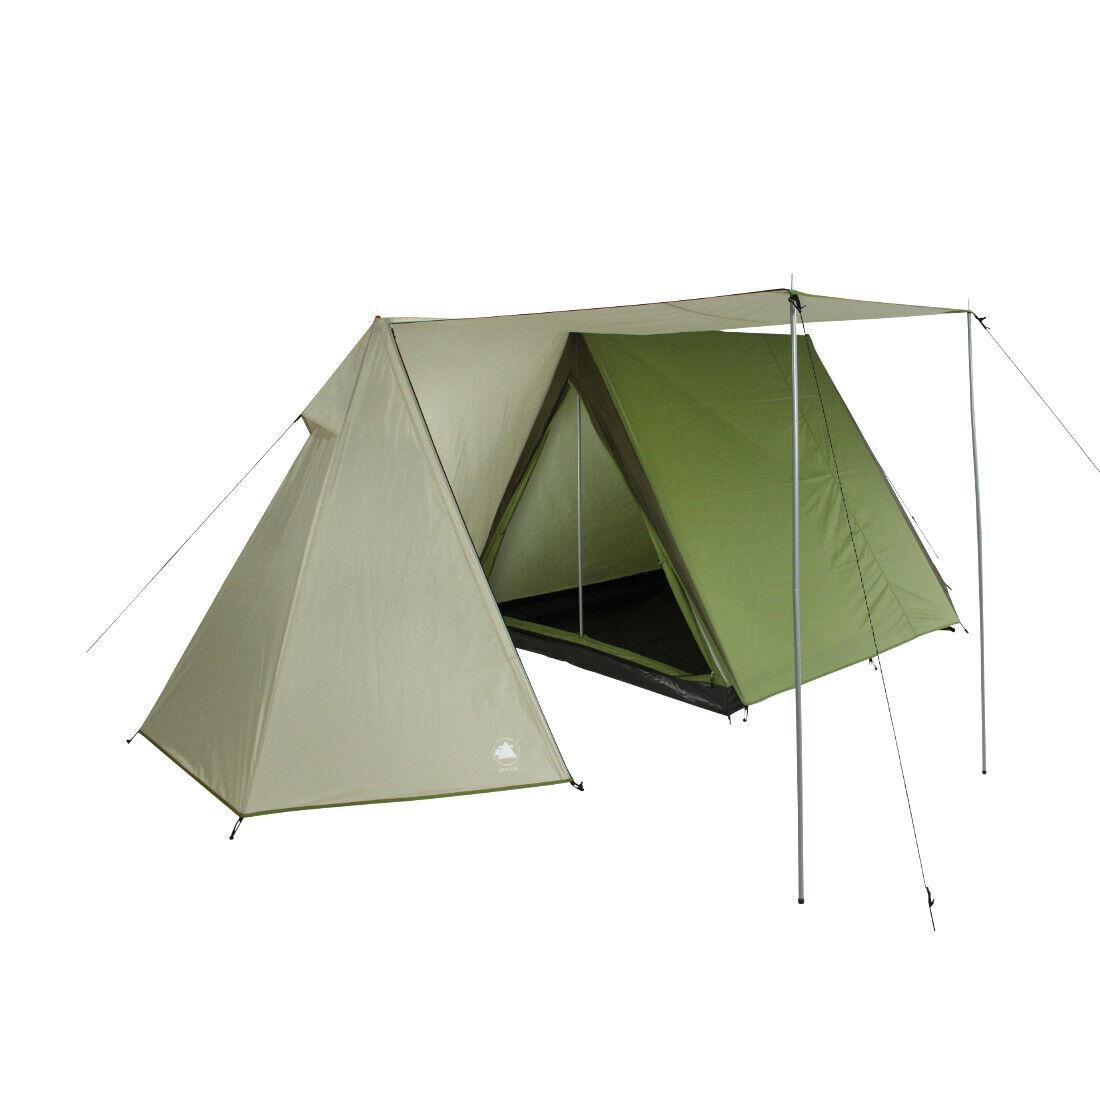 Carpa camping Mungaroo 3 personas Carpa casa carpa familiar carpa 3000mm